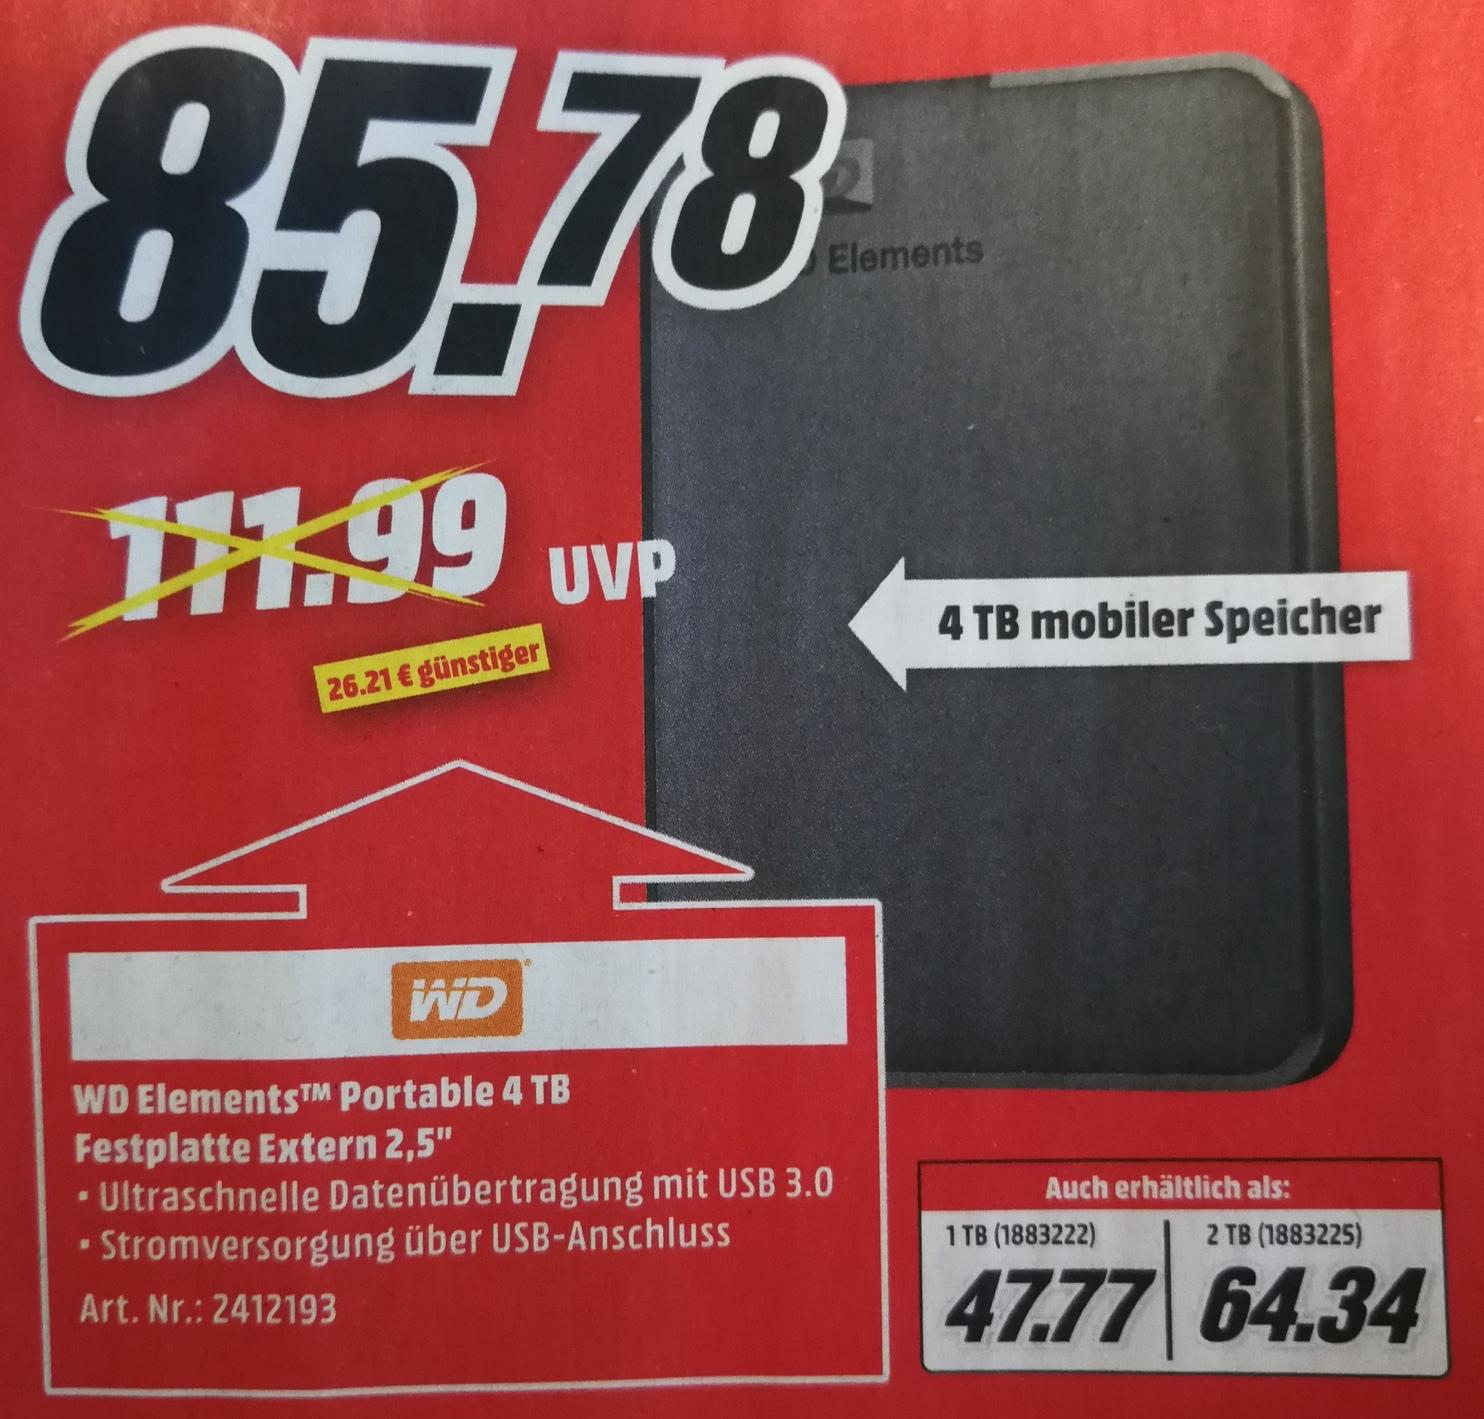 WD Elements Portable 4TB HDD, 2,5 Zoll, externe Festplatte